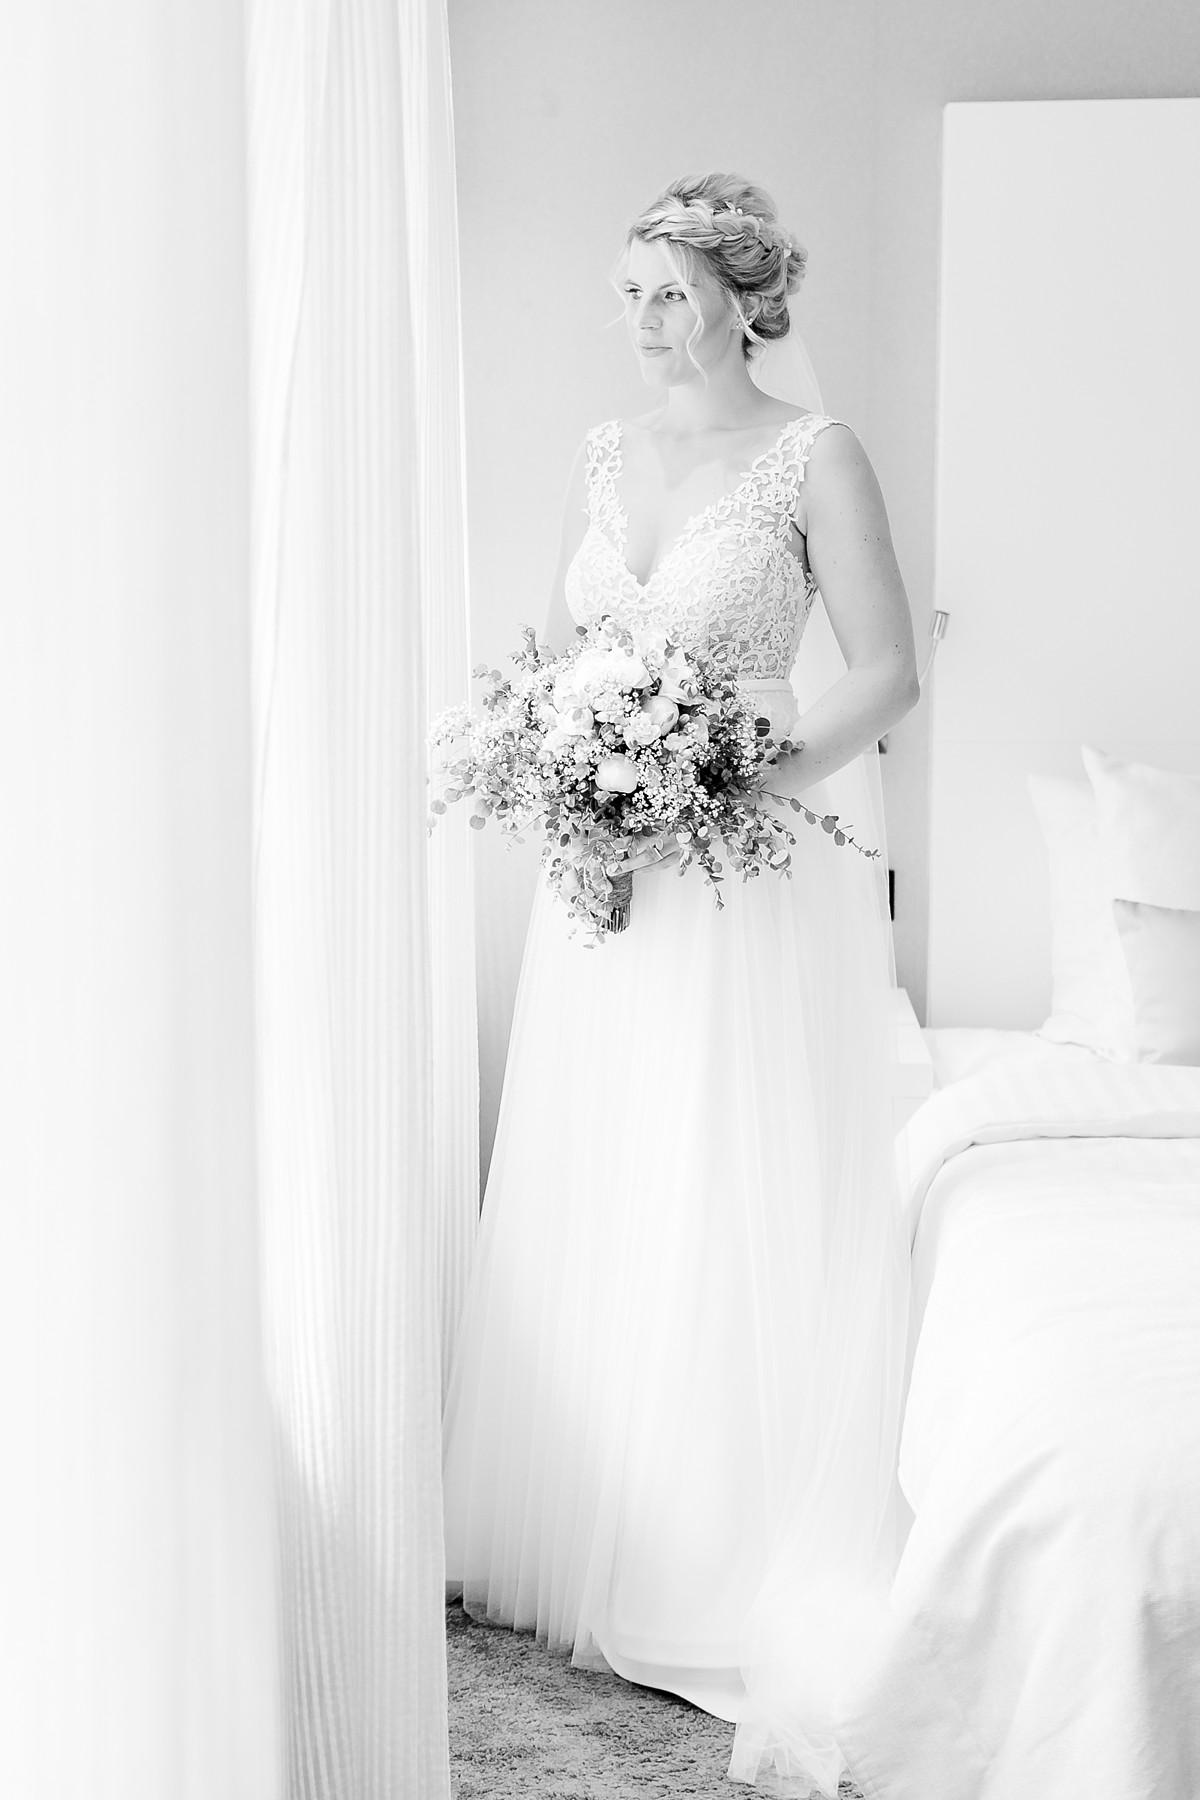 Hochzeitsfotograf-Hildesheim-Hannover-Fotograf_0030